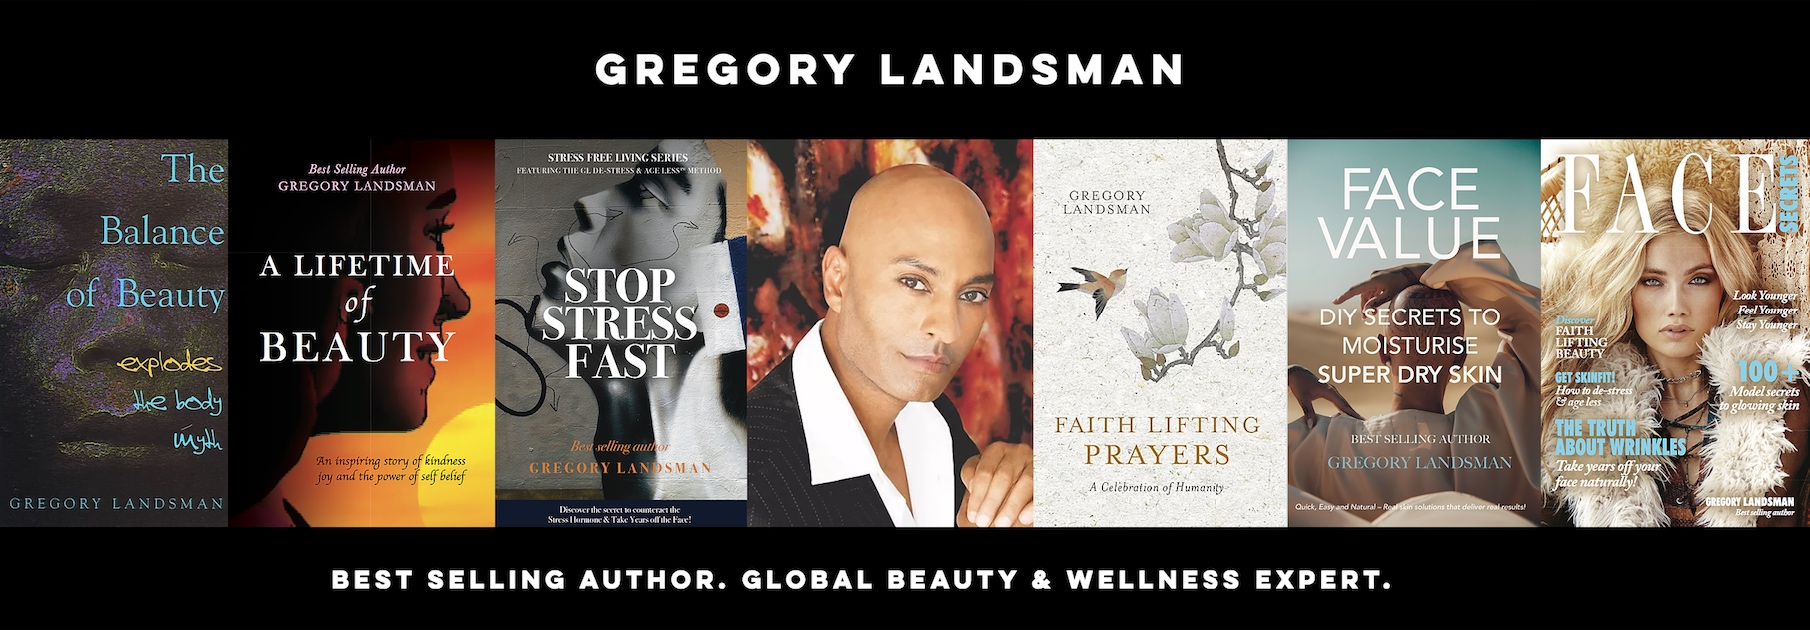 Author Gregory Landsman